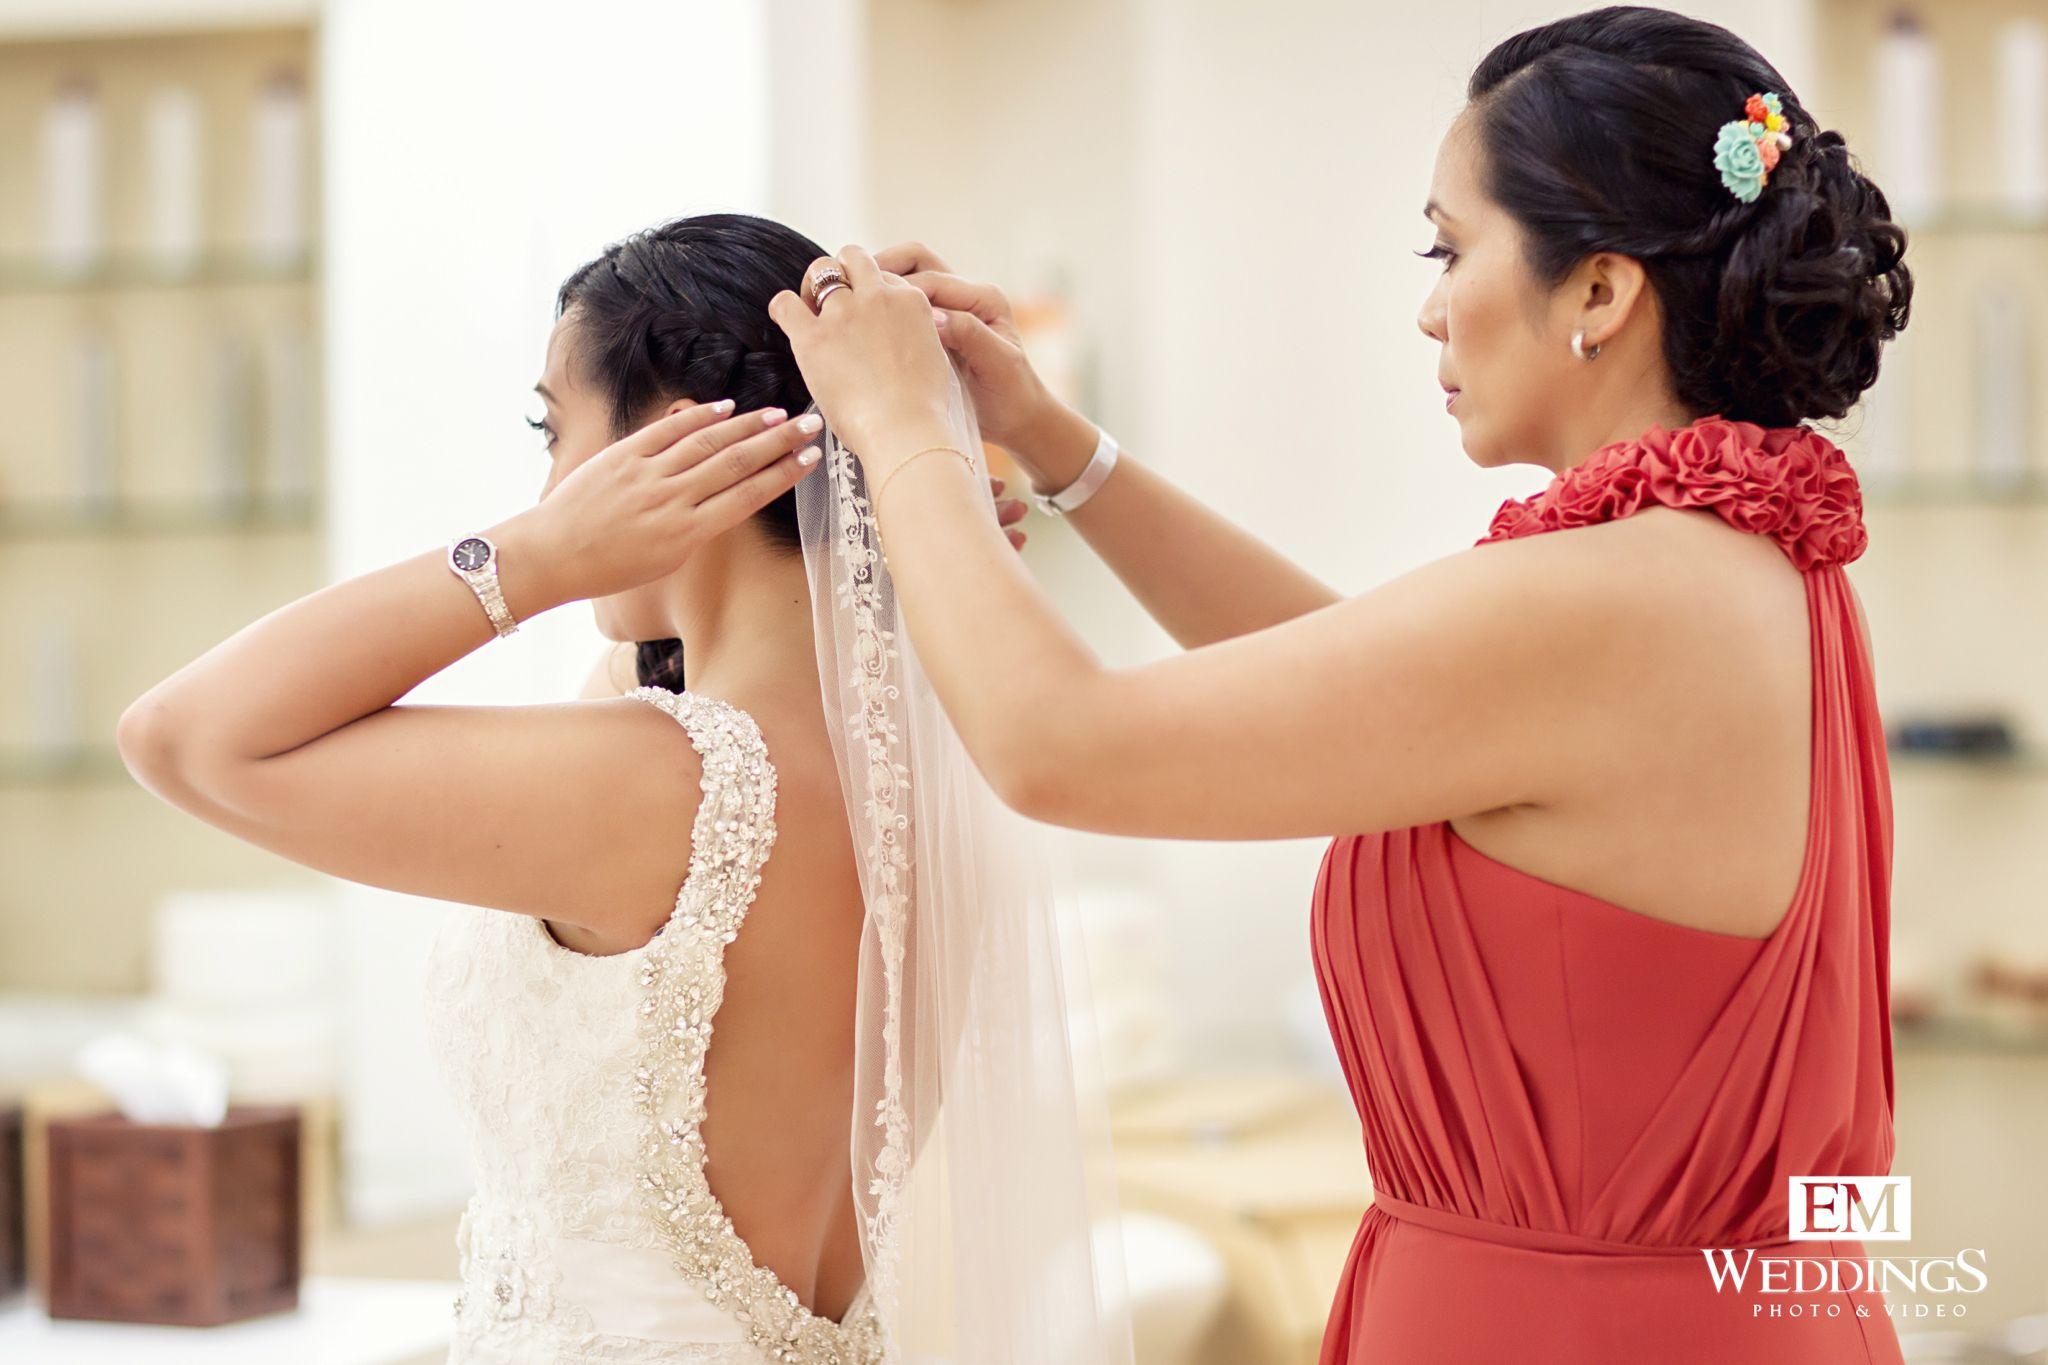 Bride Getting Ready at Hotel Emerald Bay Pueblo Bonito, Mazatlan Sinaloa. #emweddingsphotography #destinationweddings